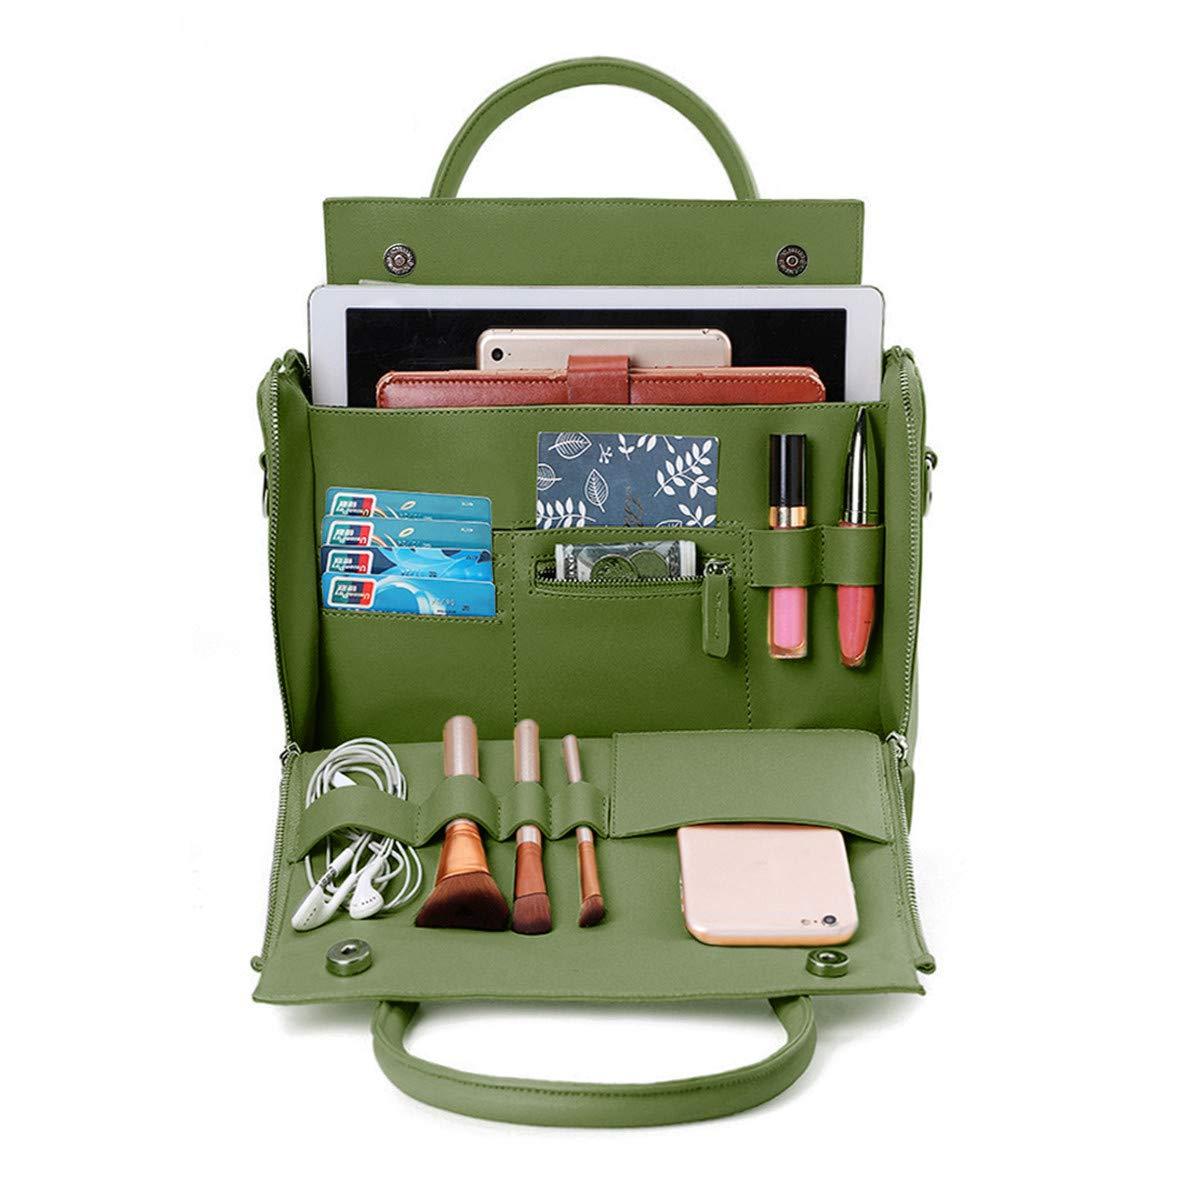 Brenice Travel Makeup Bag, Women Solid Cosmetic Handbag Capacity Bag Multifunction Crossbody Bag Green 9.25''x 4.75''x 6.5''